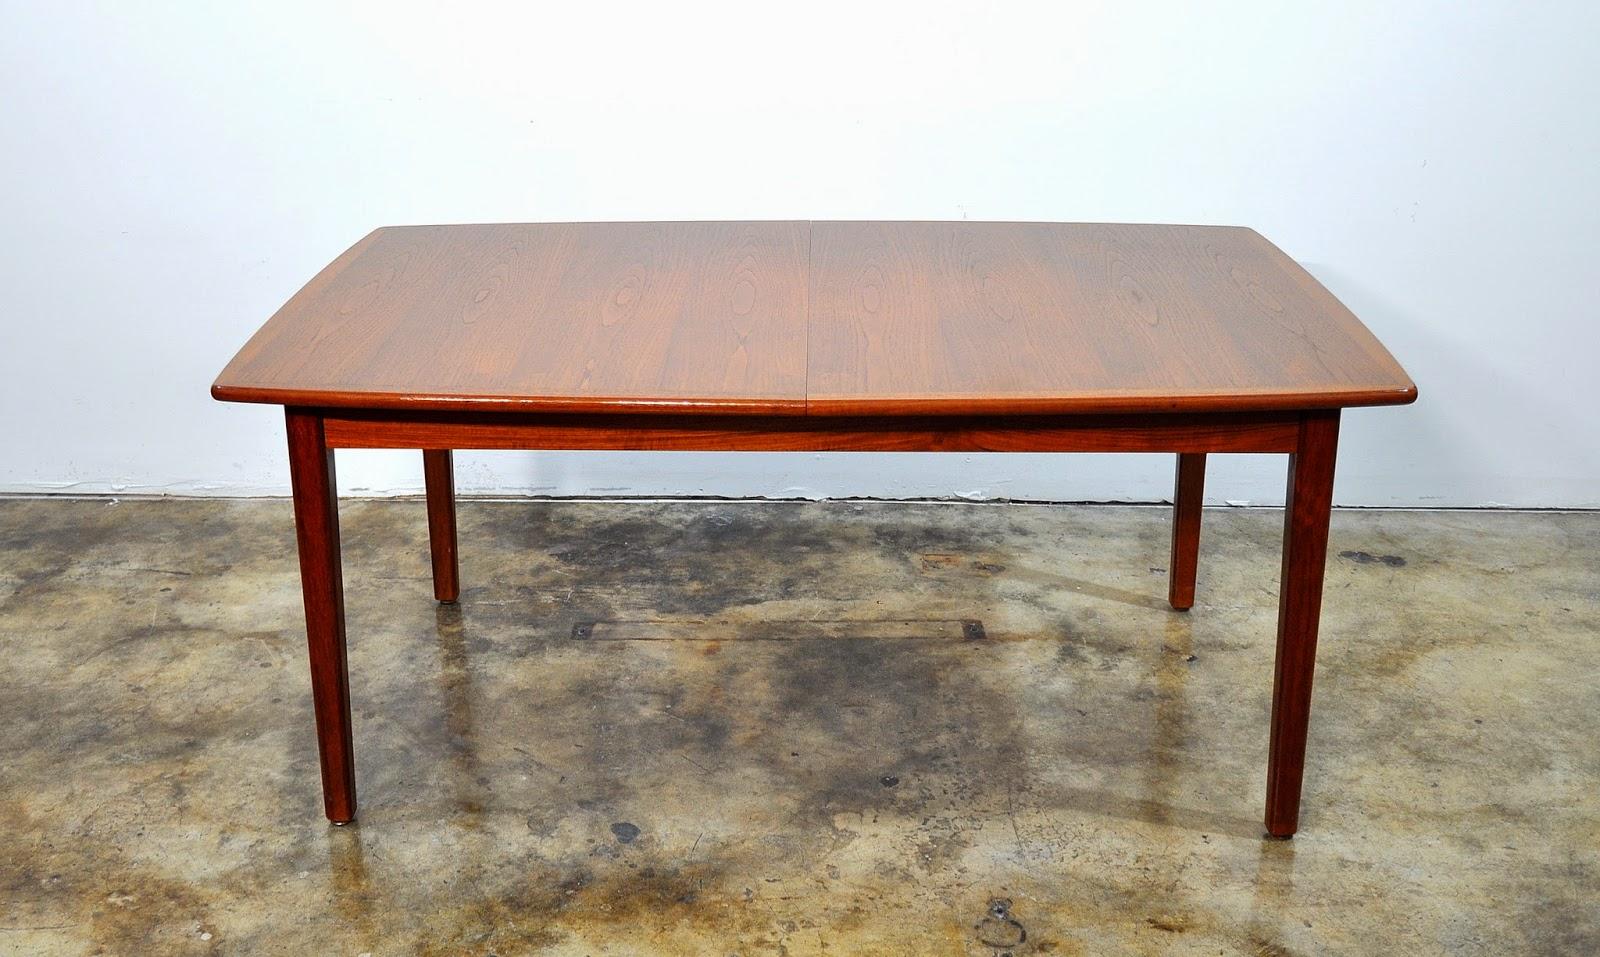 SELECT MODERN Falster Teak Expandable Dining Table : FalsterTeakDiningTable3 from midcenturymoderndesignfinds.blogspot.com size 1600 x 957 jpeg 324kB